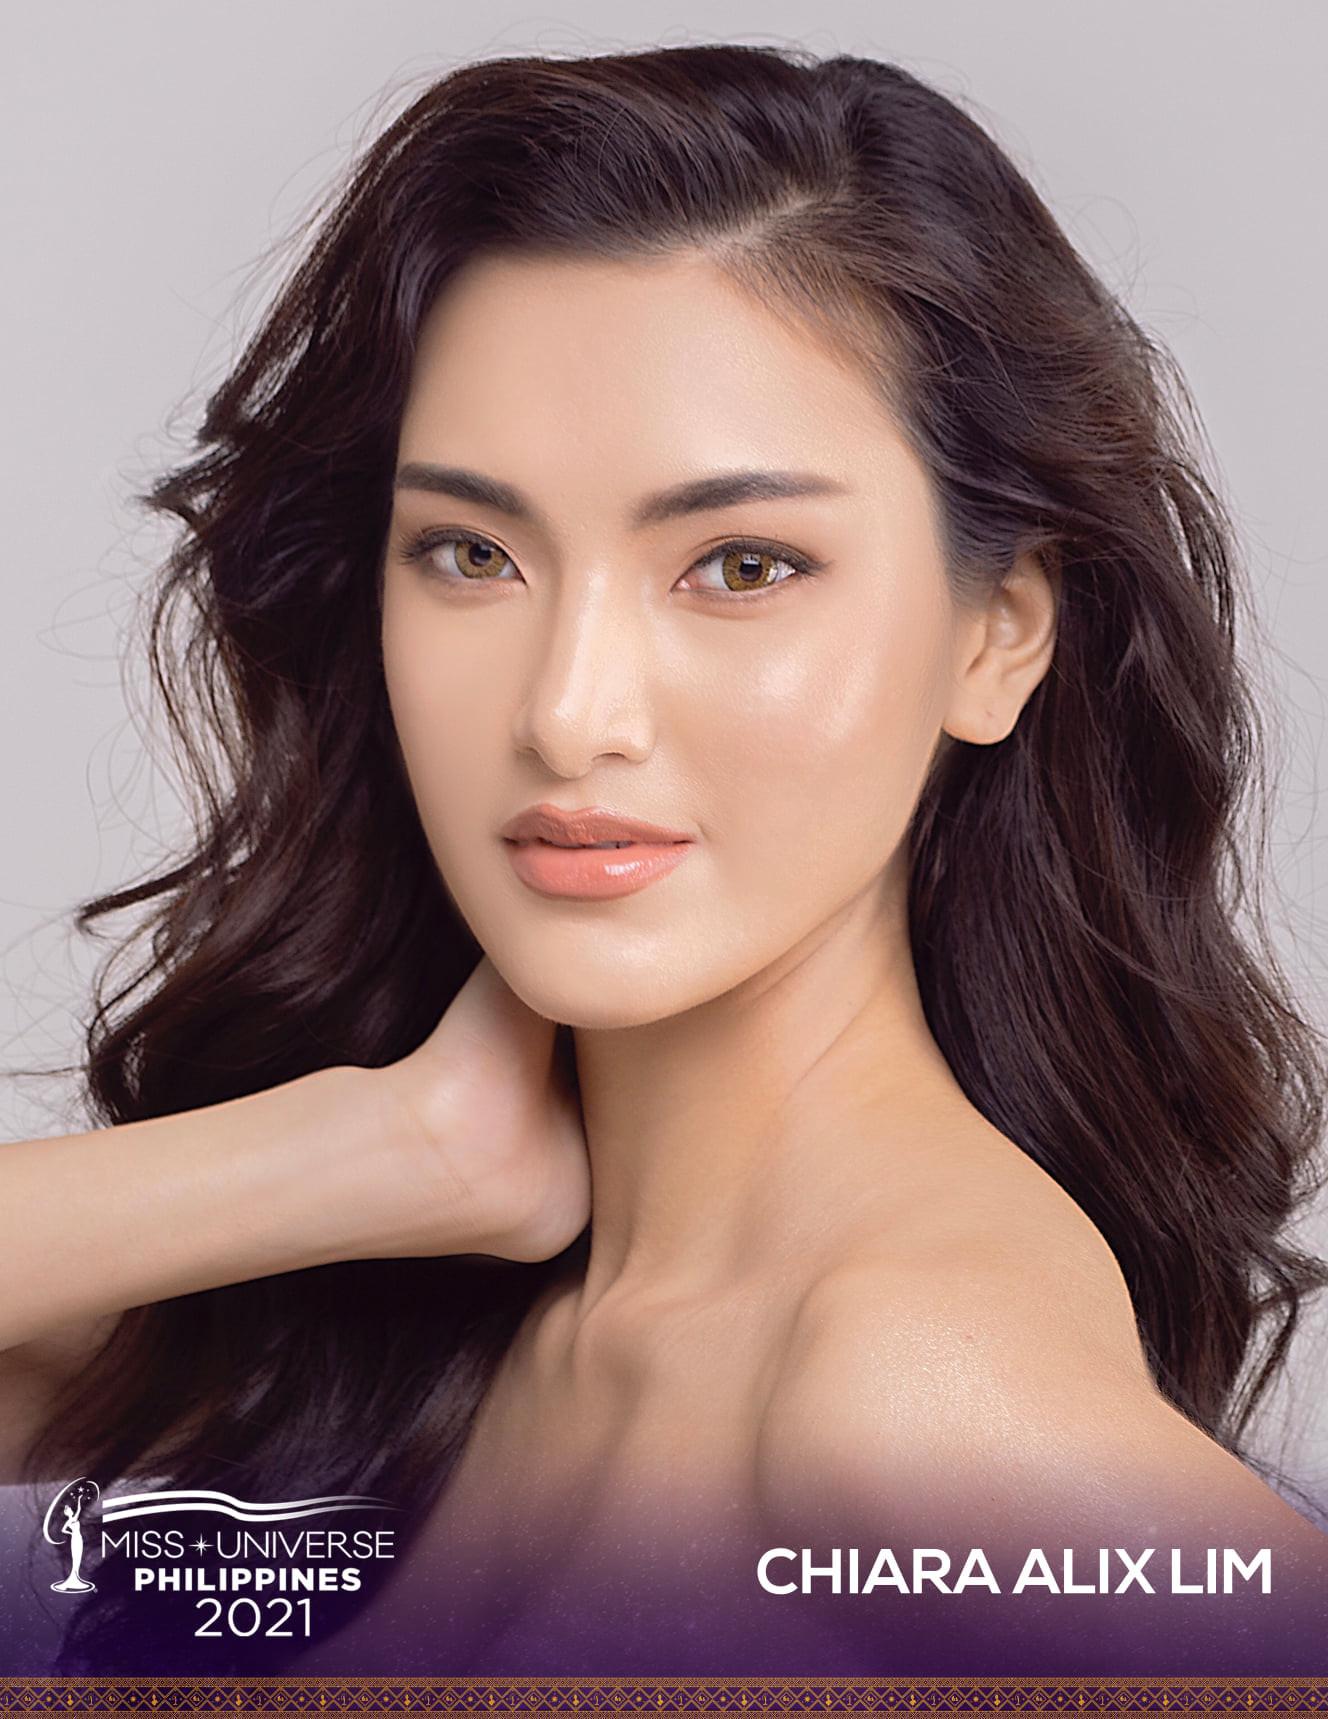 pre-candidatas a miss universe philippines 2021. - Página 4 AlurxI